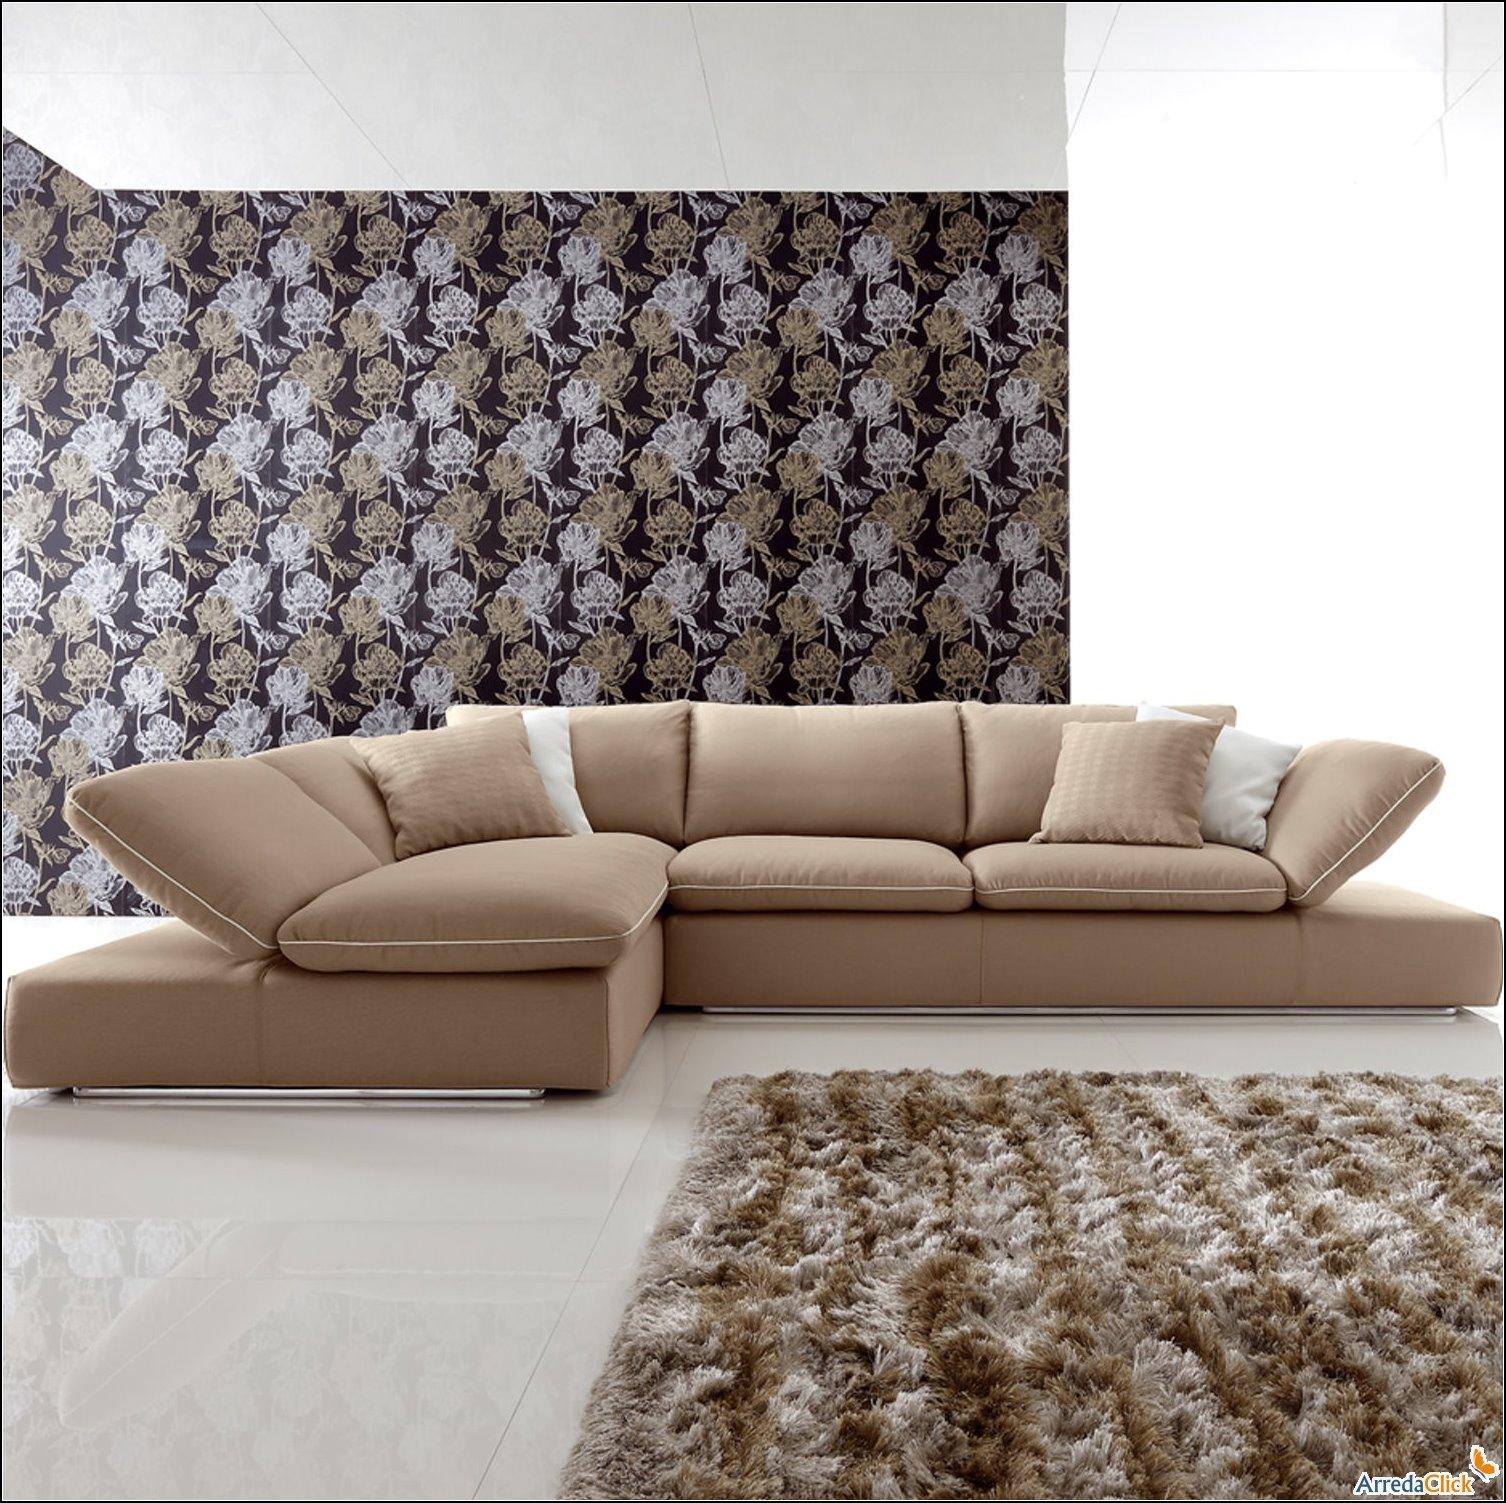 Arredaclick muebles italianos online sof s modernos - Sofas italianos modernos ...